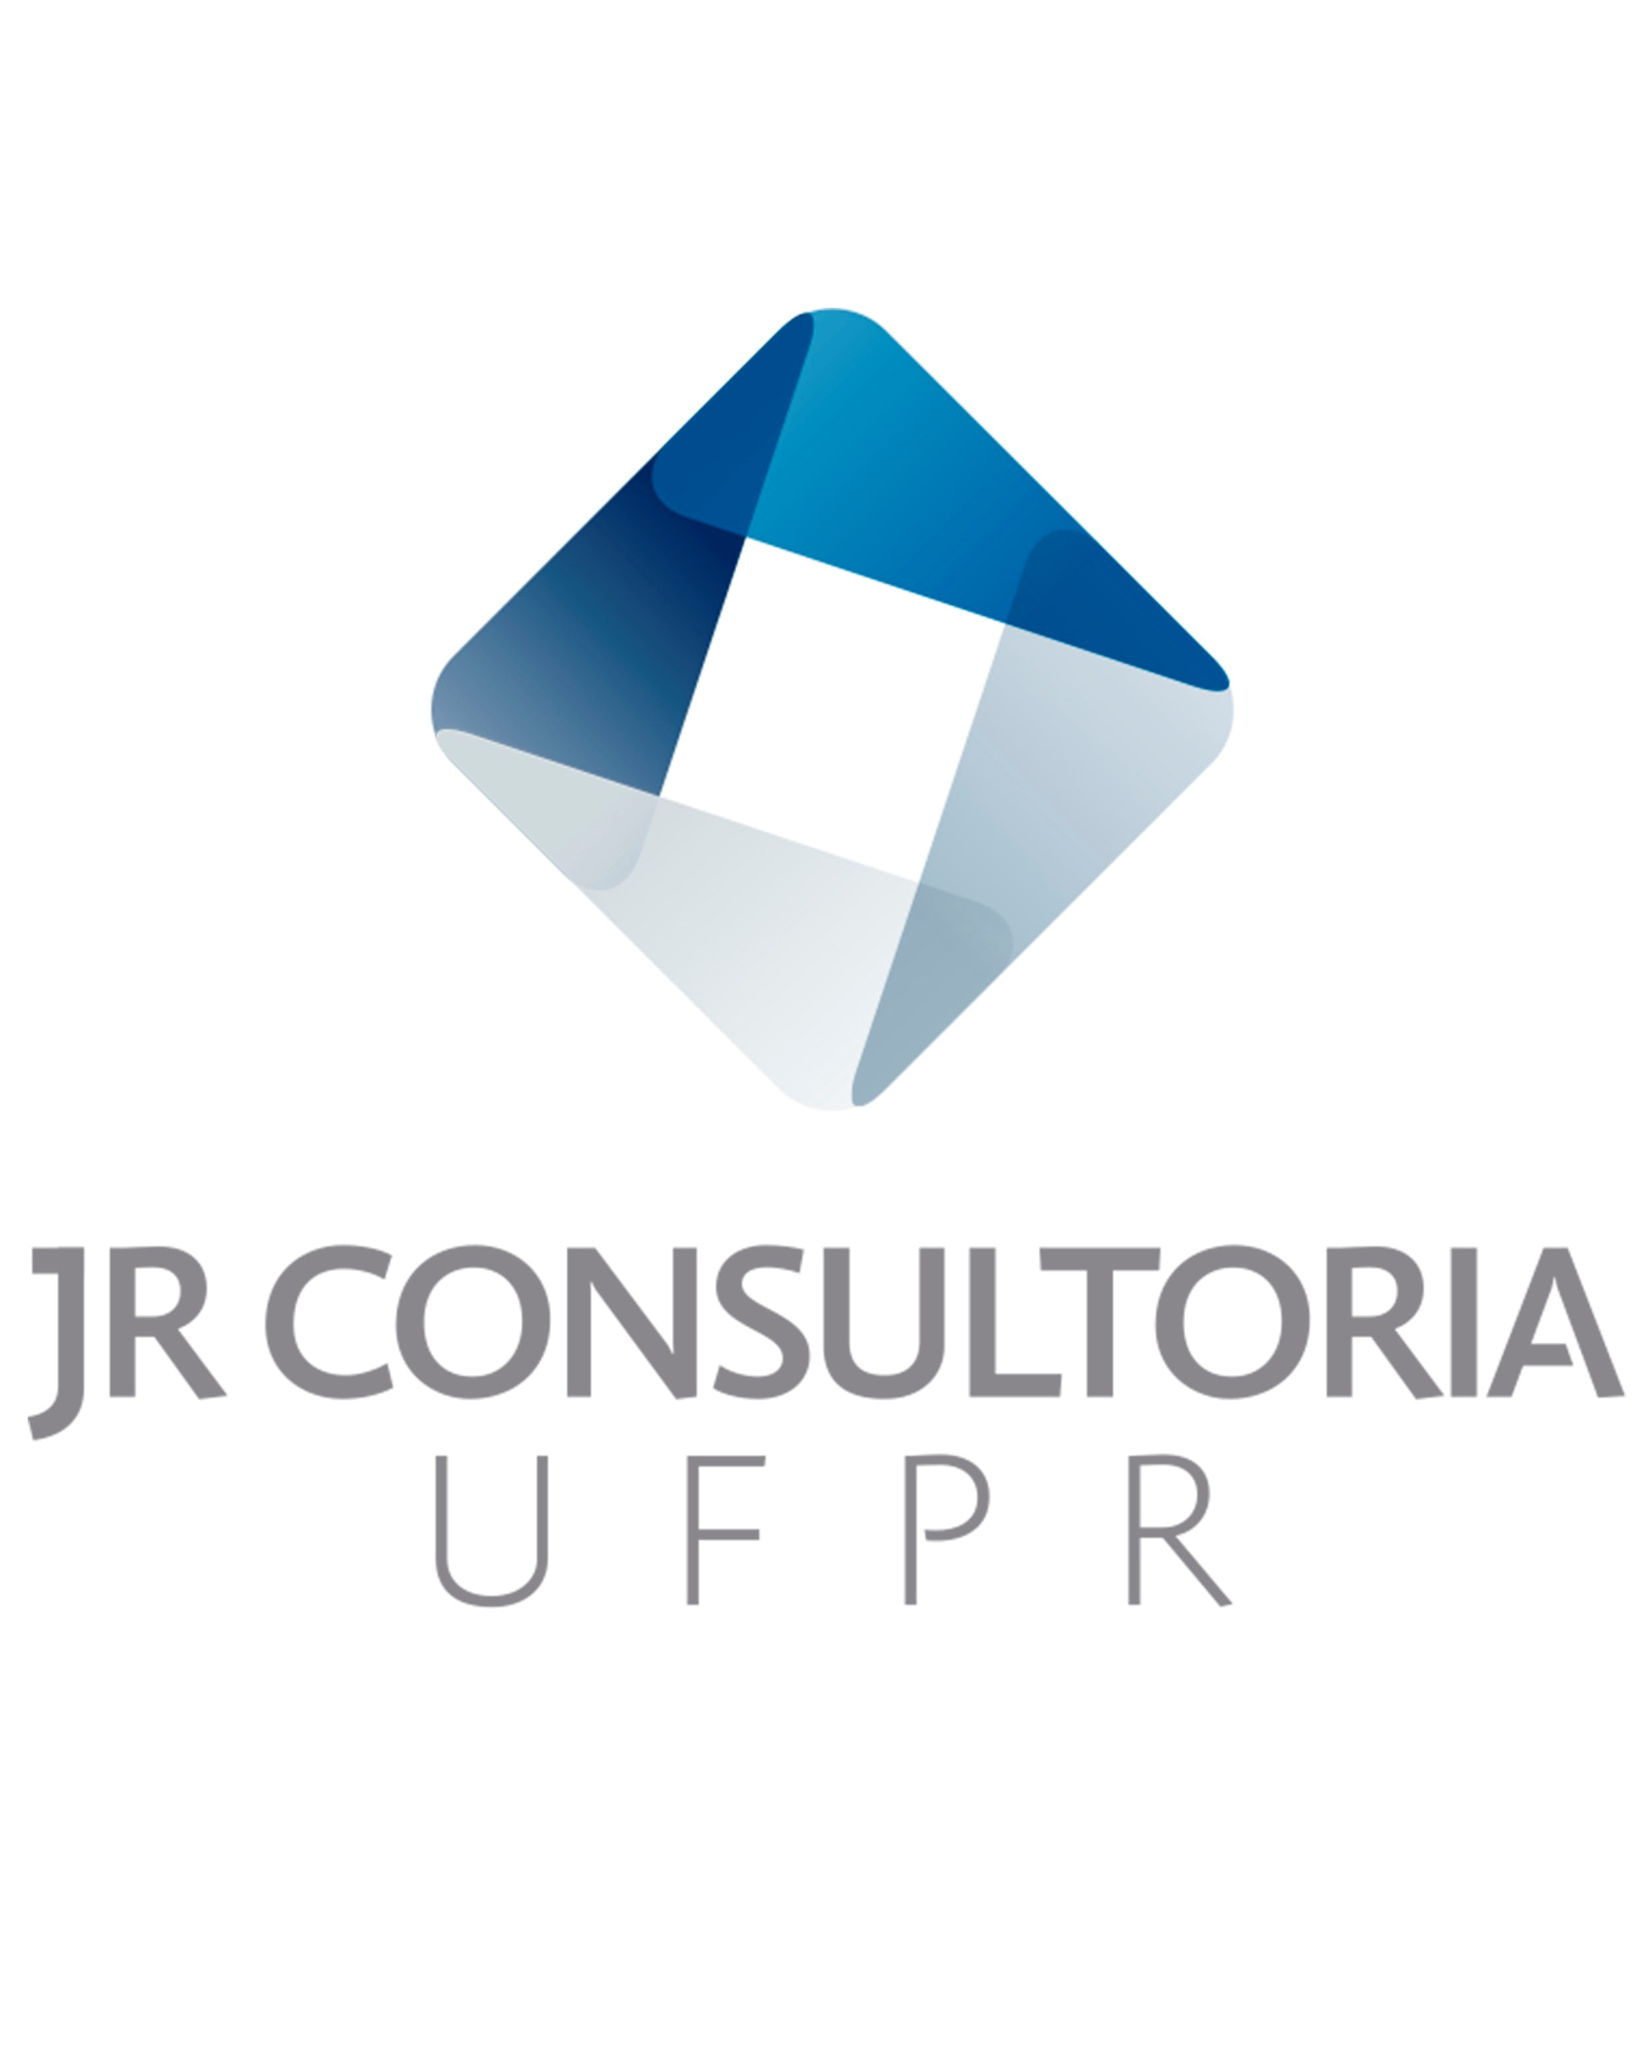 JR Consultoria UFPR.jpg